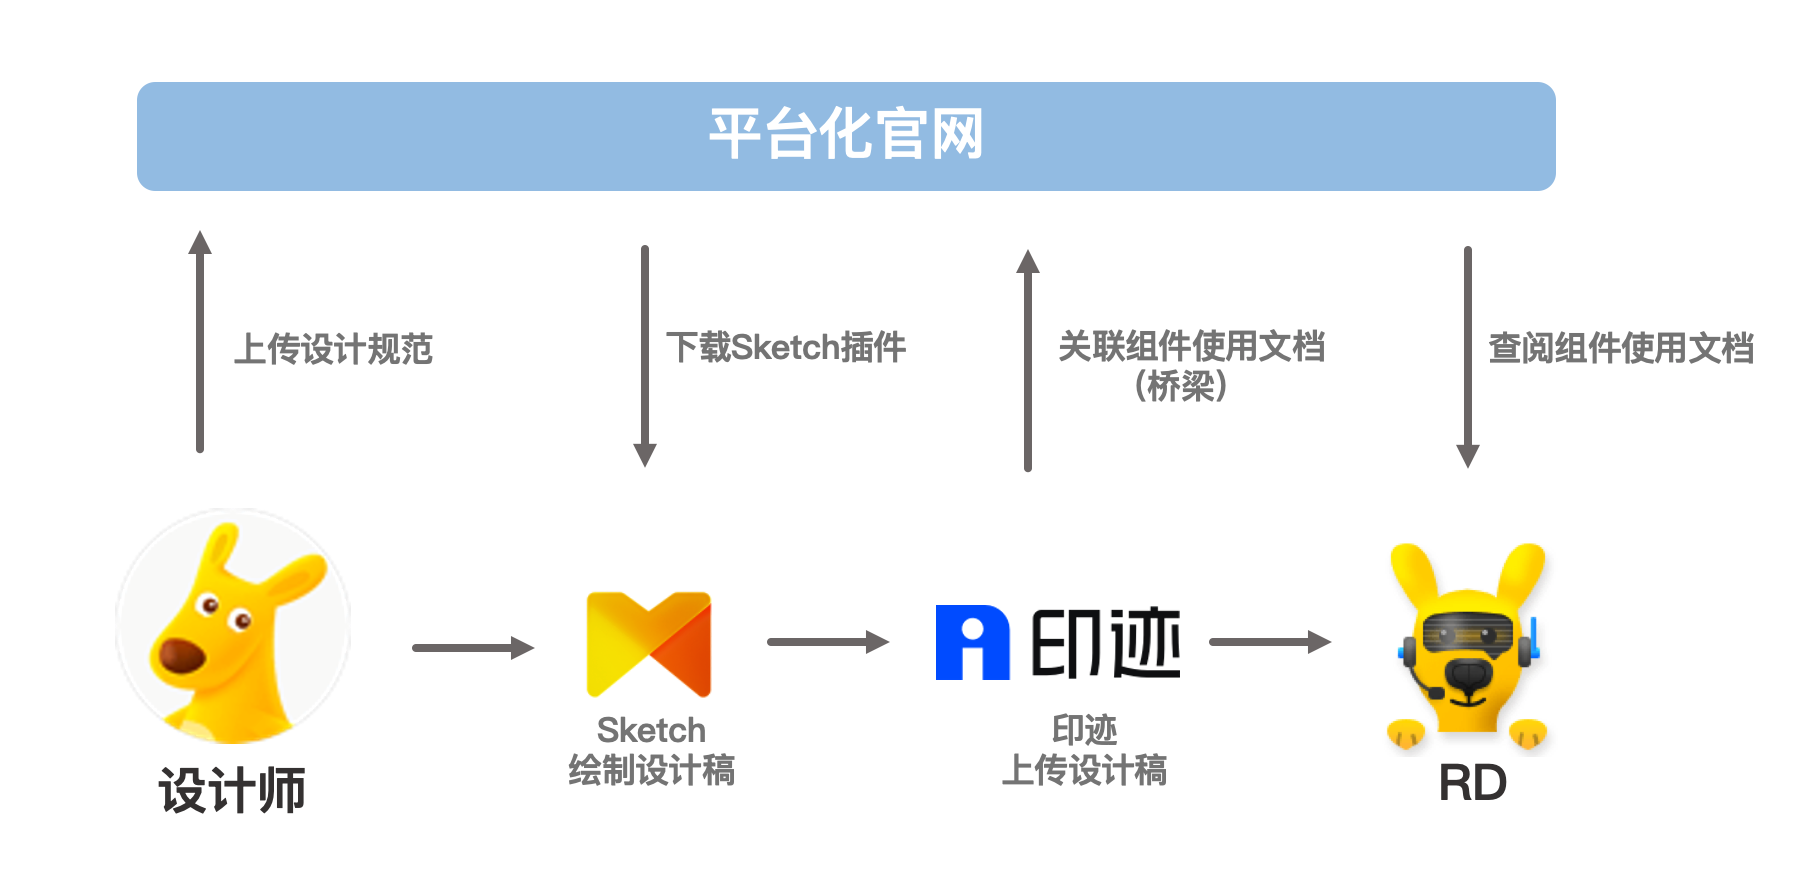 UI一致性协作流程闭环